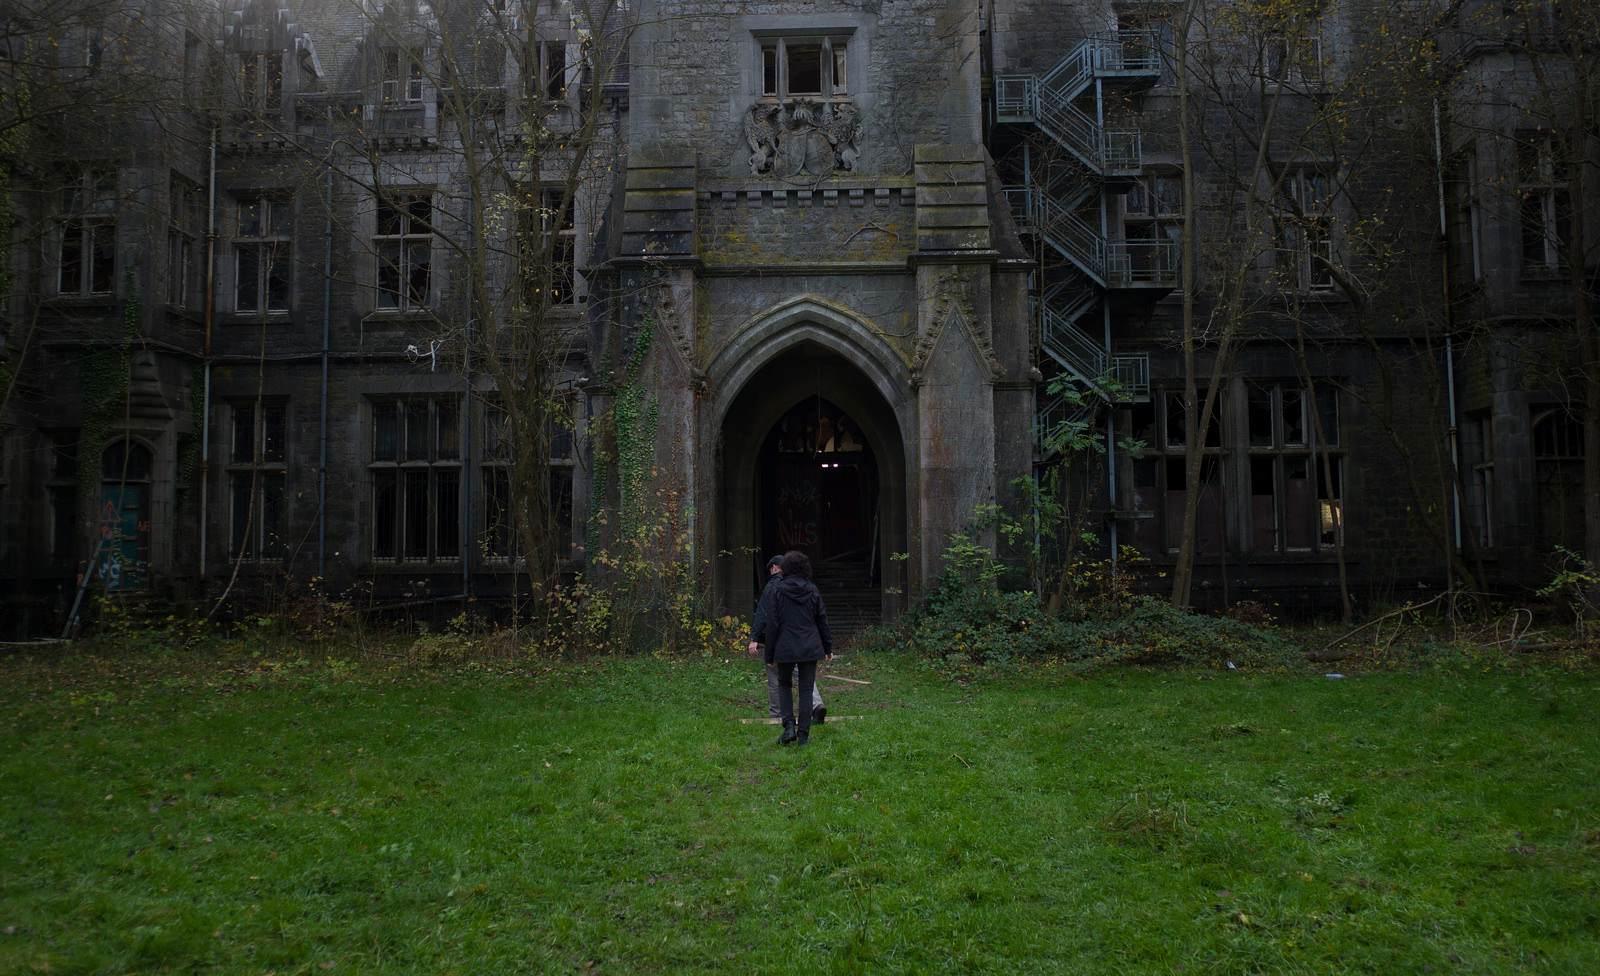 castle miranda1 The Abandoned Castle Miranda, Belgium